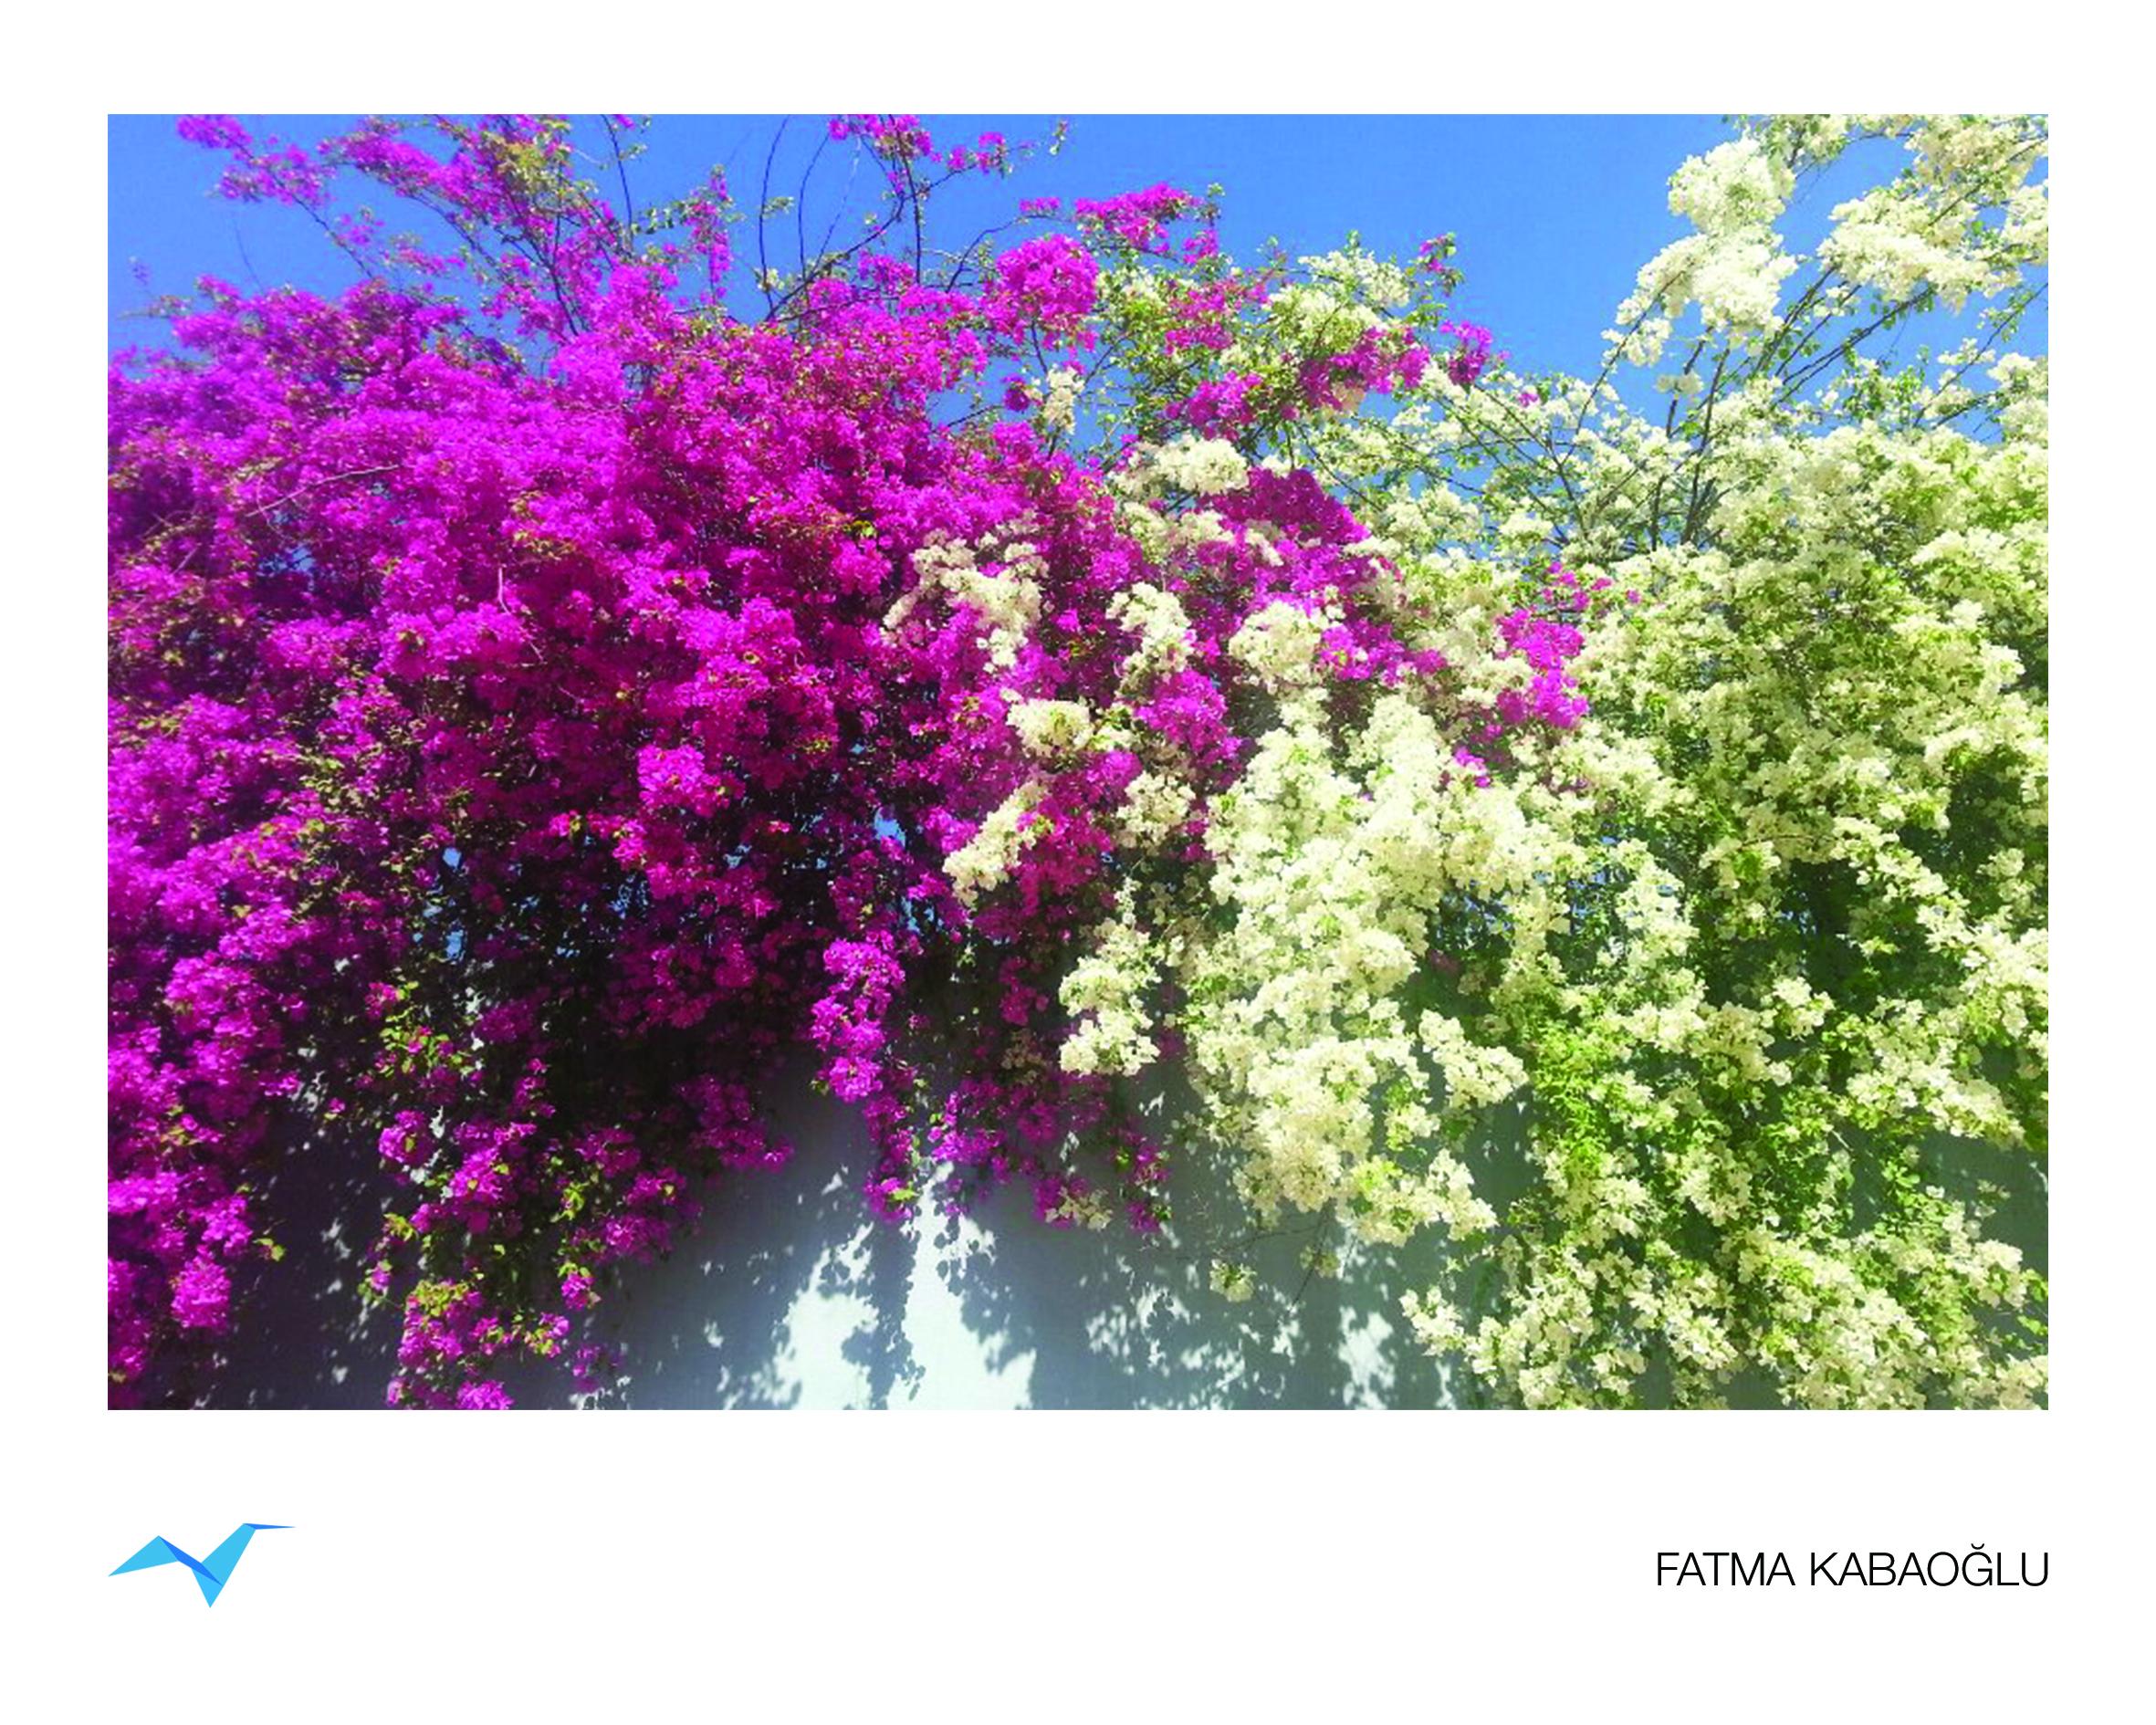 Fatma_Kabaoglu_3